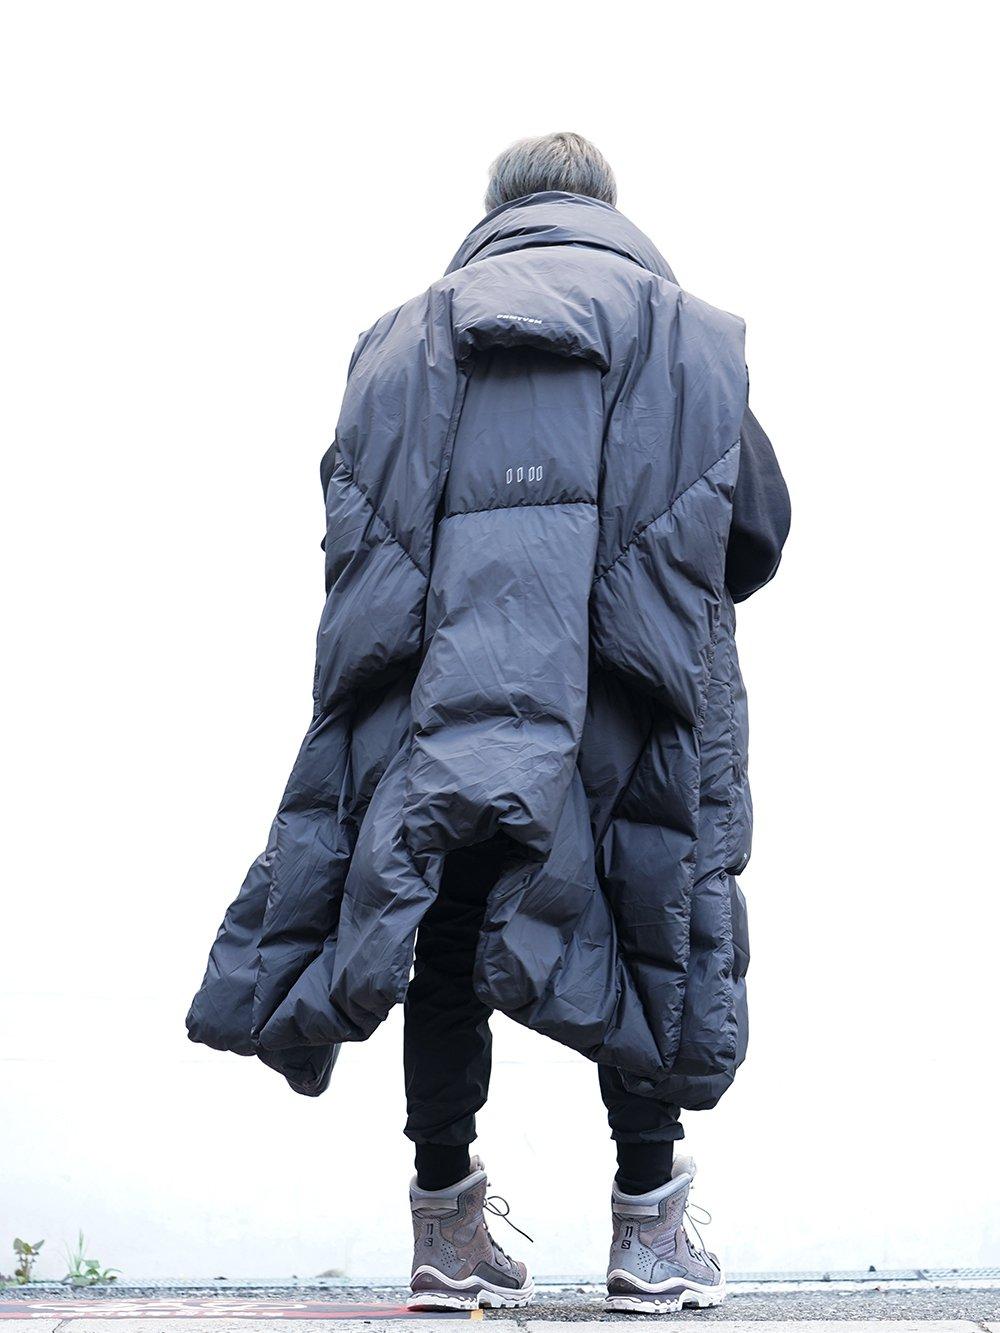 HAMCUS × NILøS 19aw Down long vest Black Styling!! - 1-003